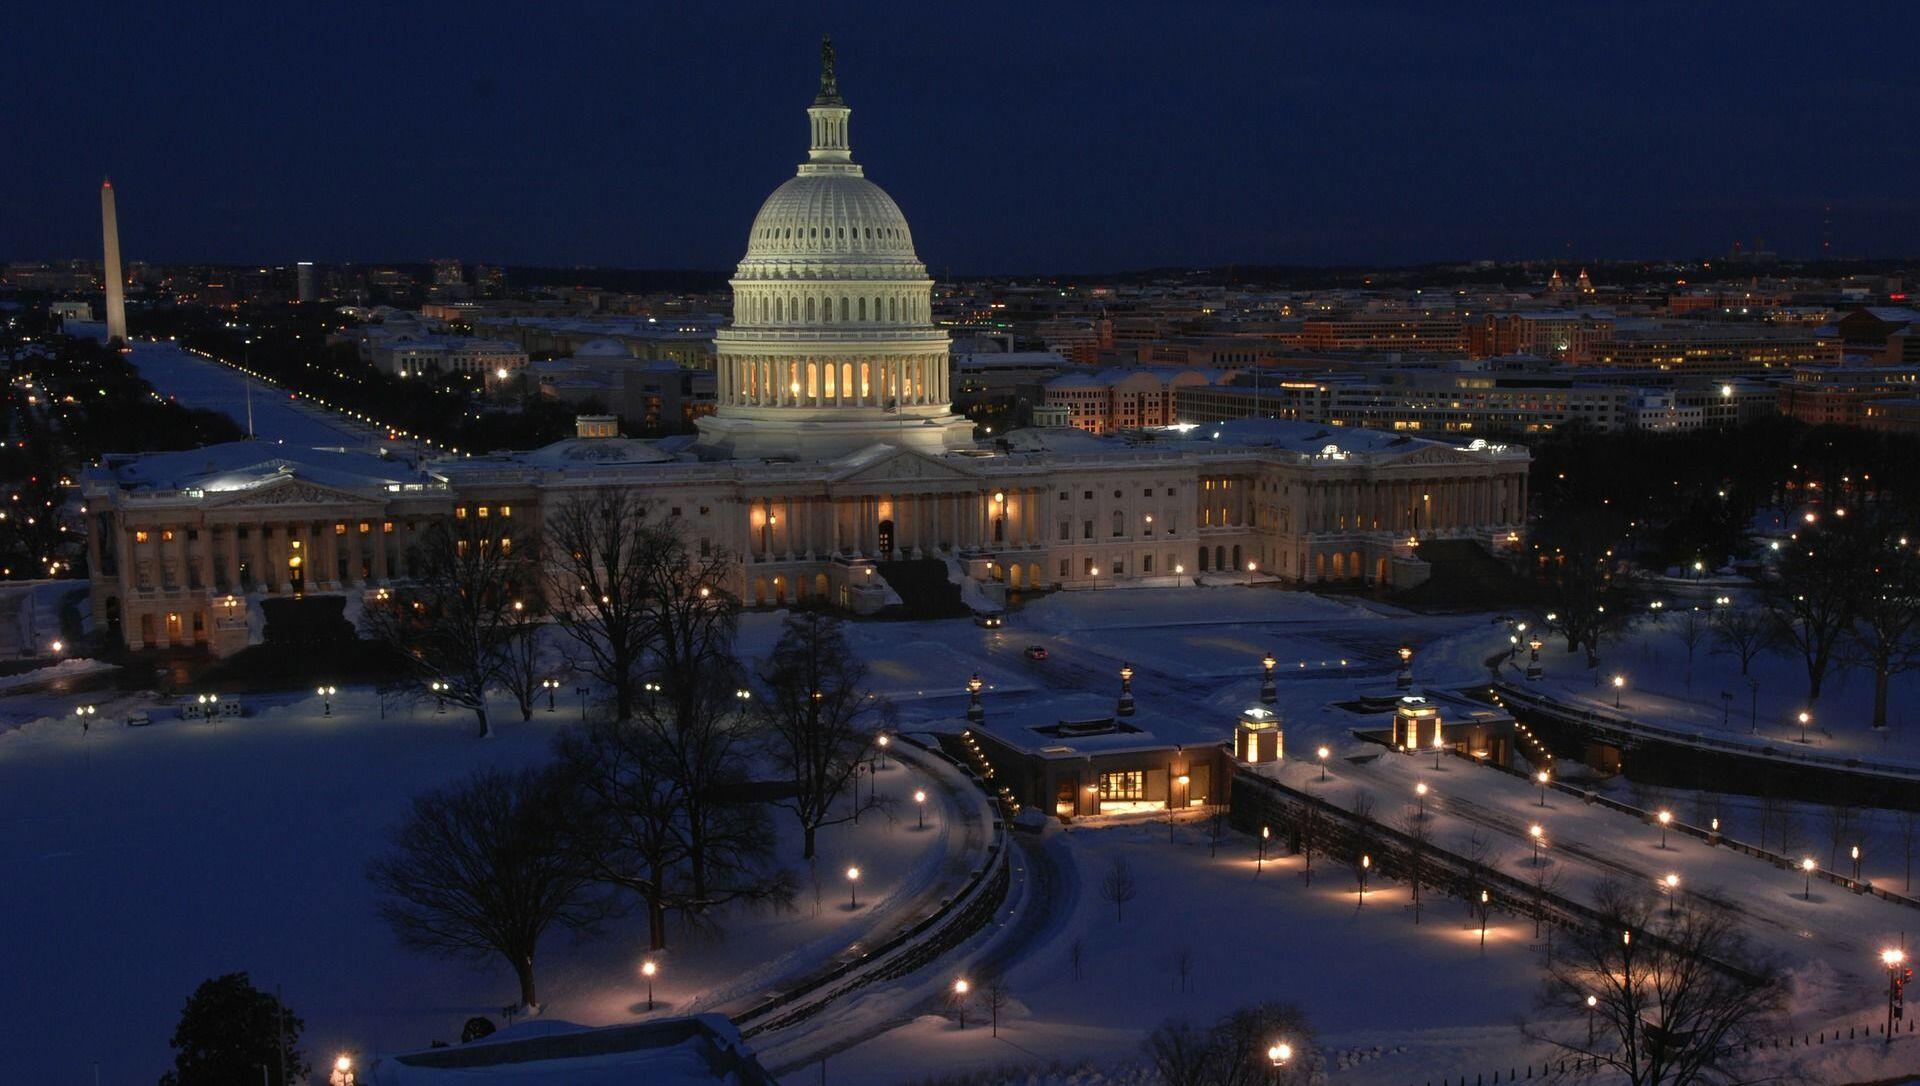 Budova Kongresu USA ve Washingtonu - Sputnik Česká republika, 1920, 10.02.2021